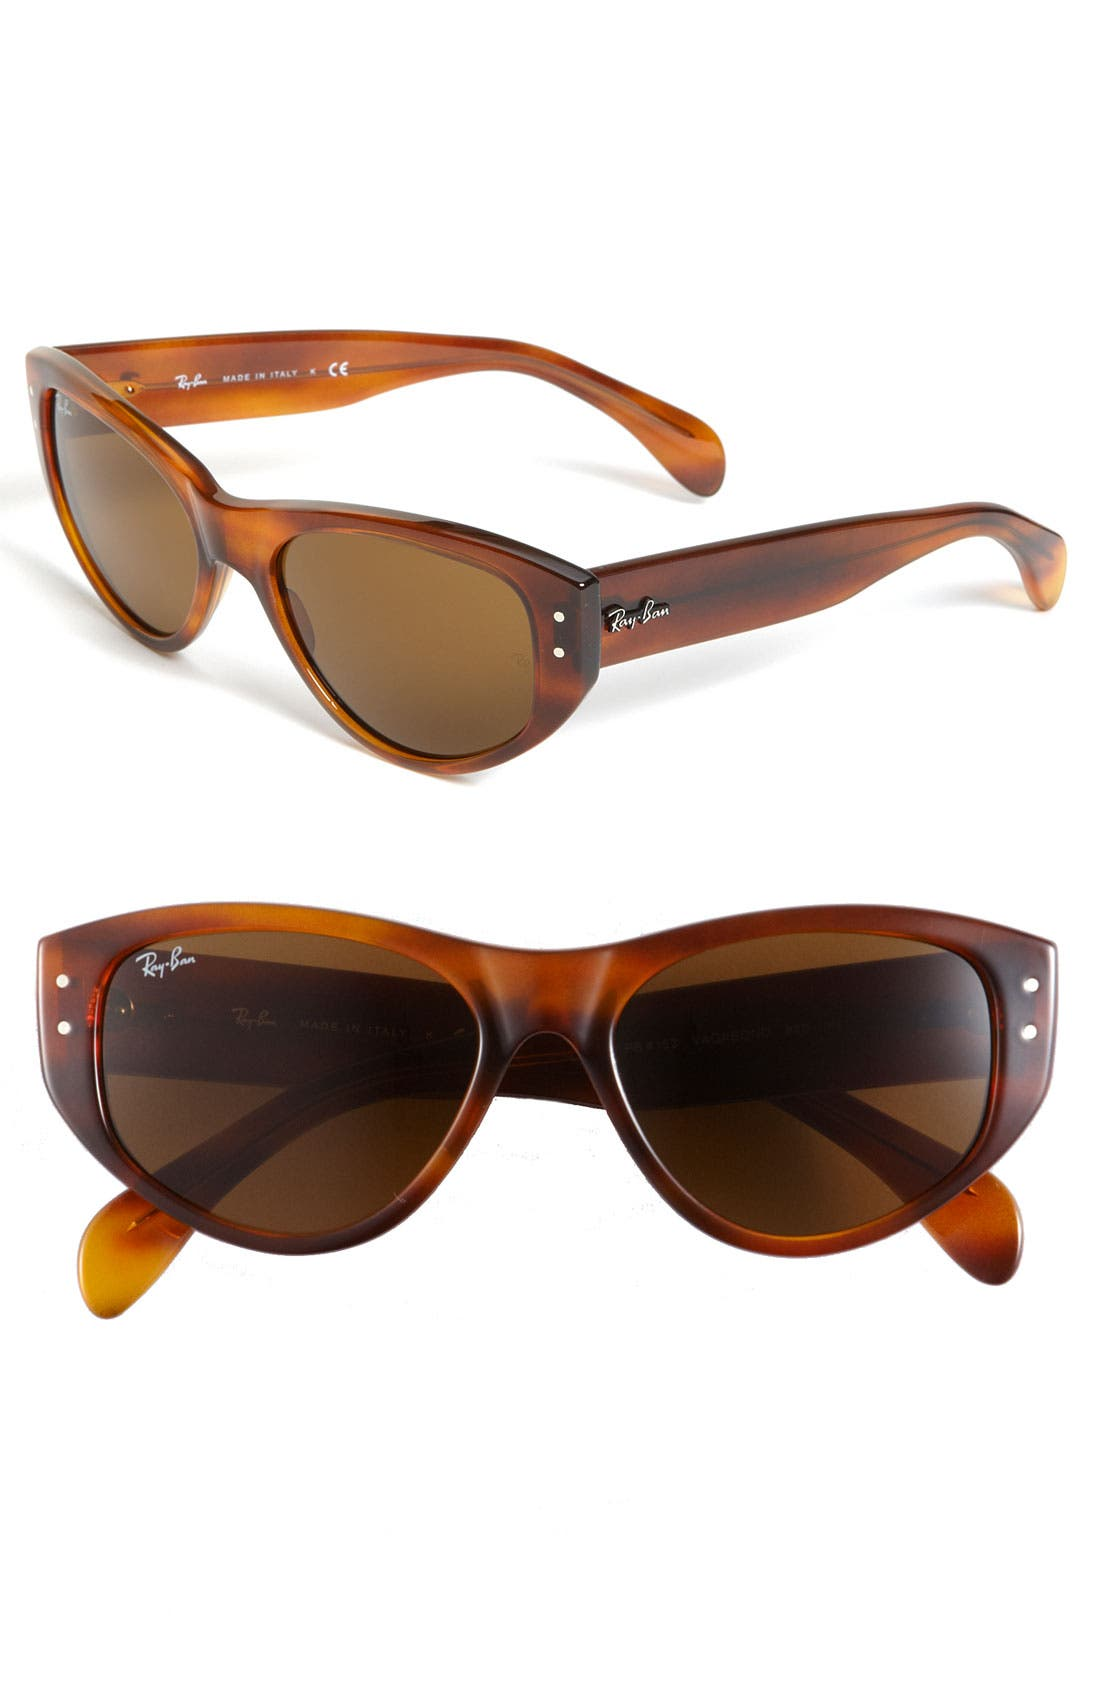 Alternate Image 1 Selected - Ray-Ban 'Vagabond' Cat's Eye Sunglasses